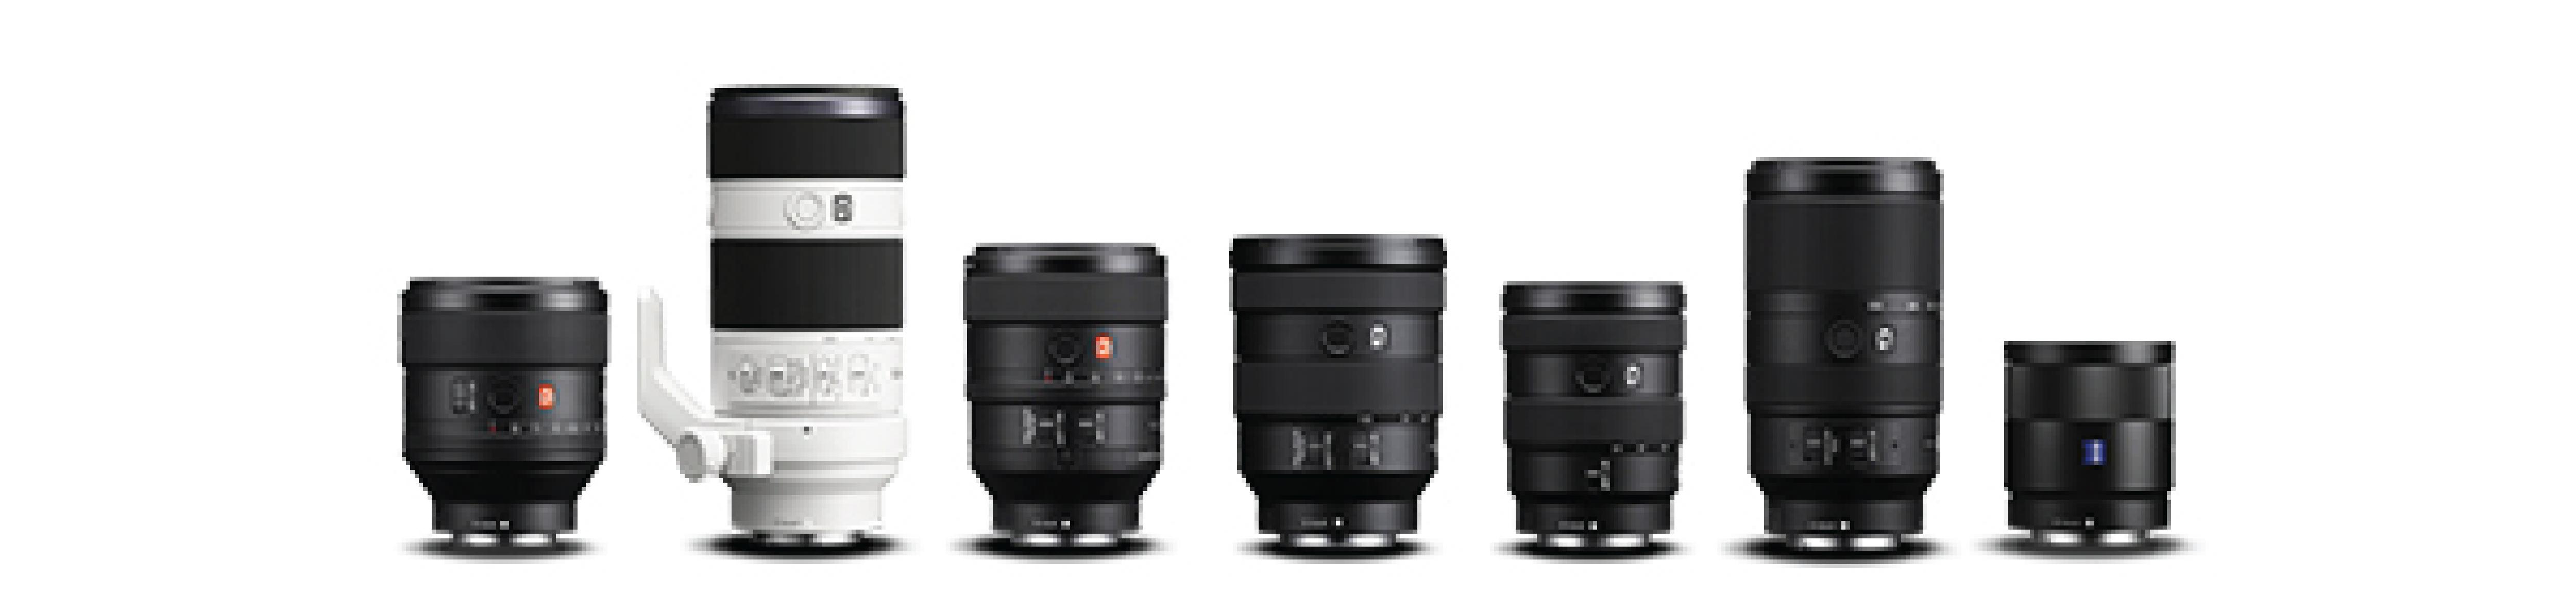 Sony TITU Lenses